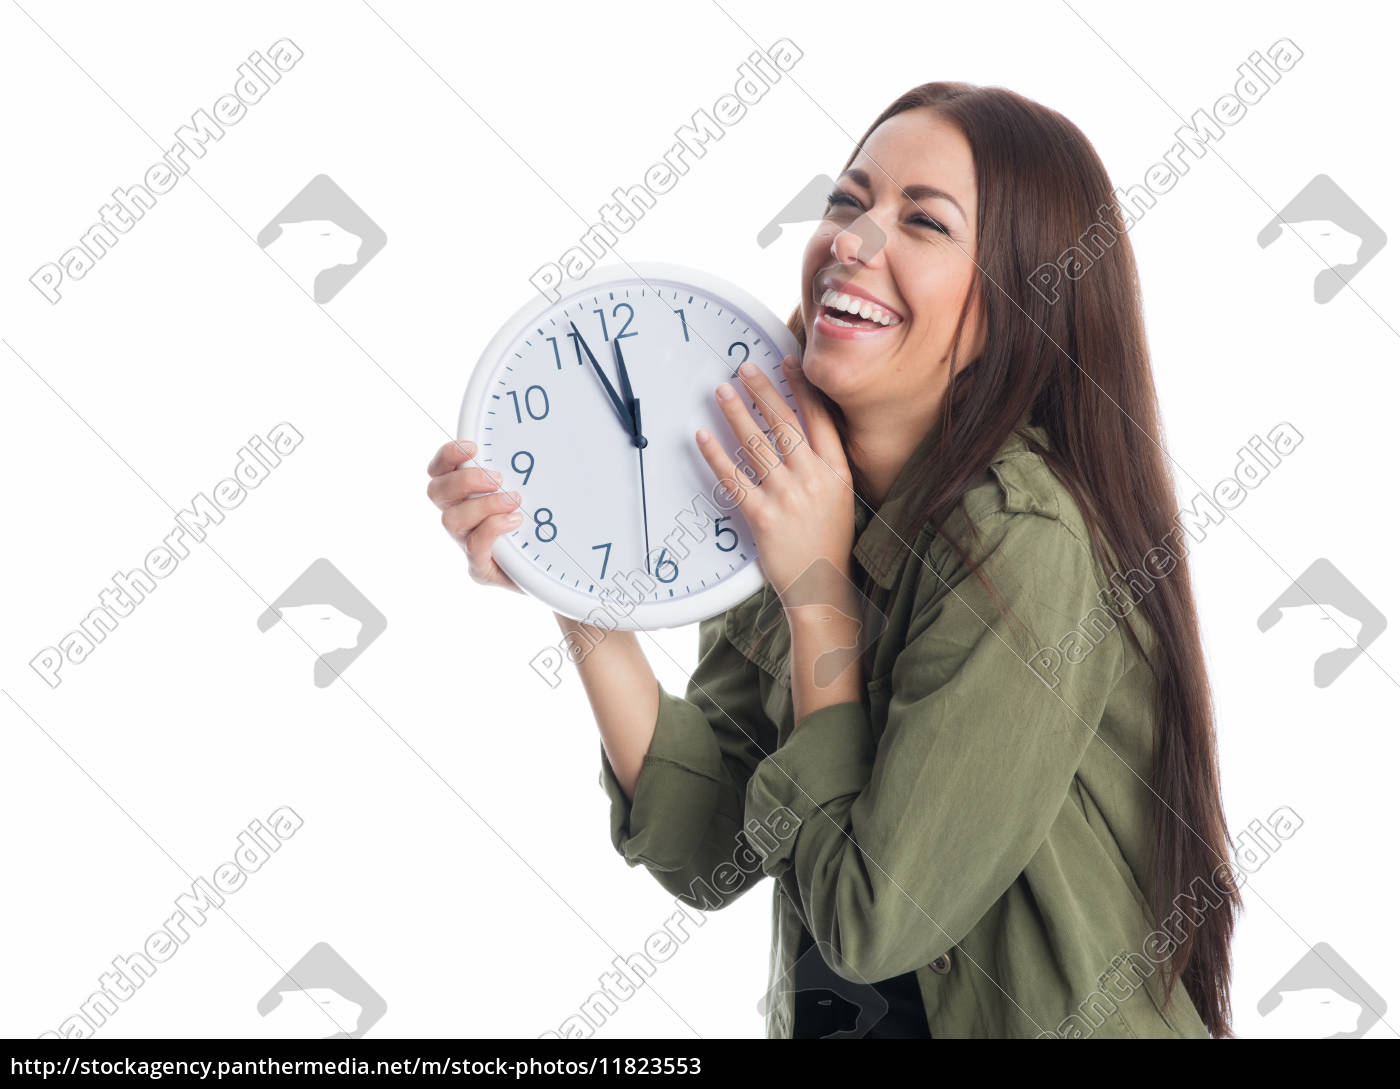 lachende, frau, mit, wanduhr - 11823553